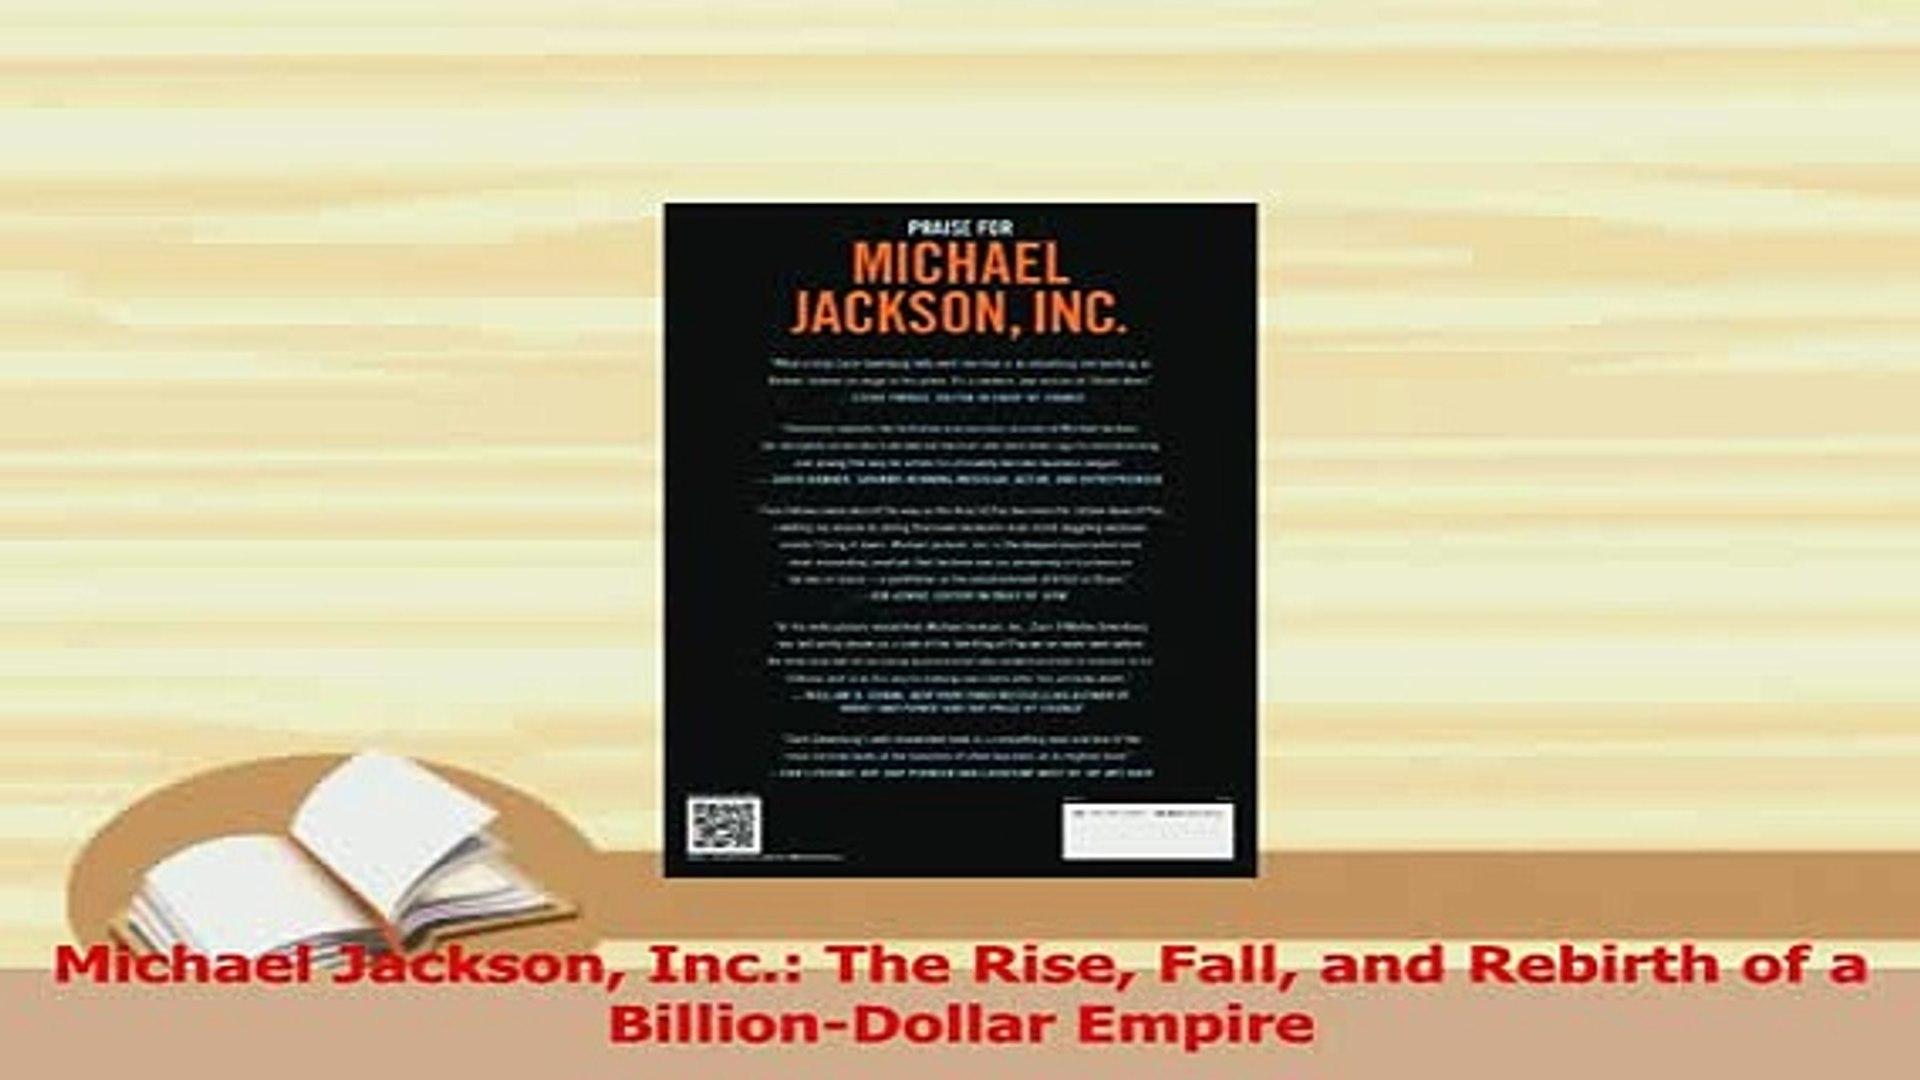 Inc.: The Rise Fall and Rebirth of a Billion-Dollar Empire Michael Jackson